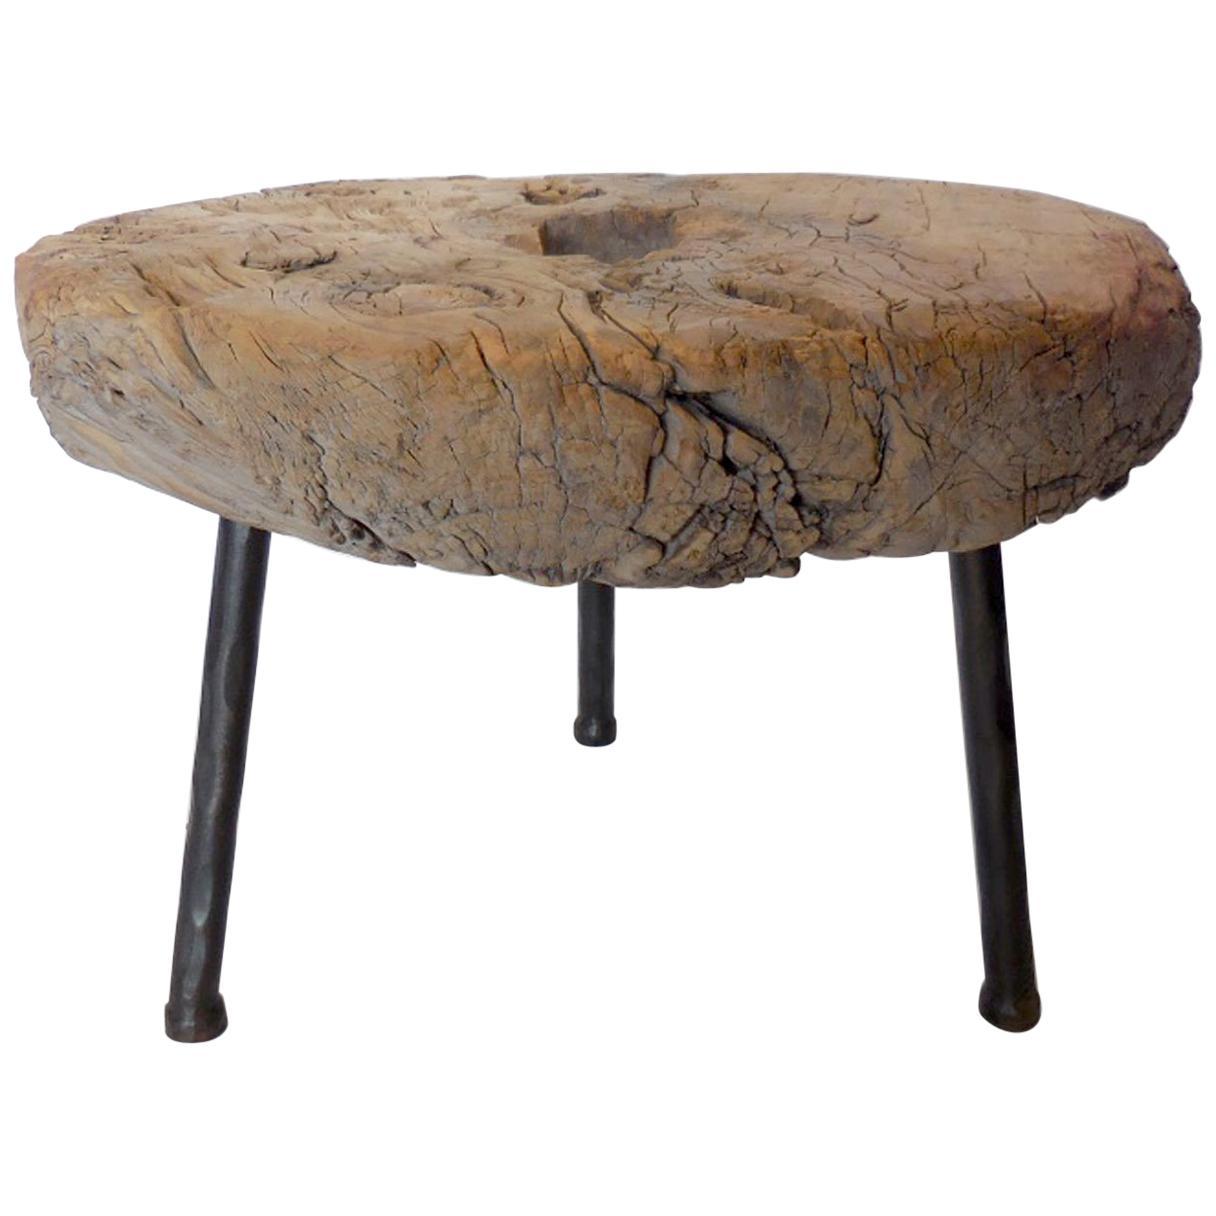 Antique Elm Wood Wheel Table on Iron Legs